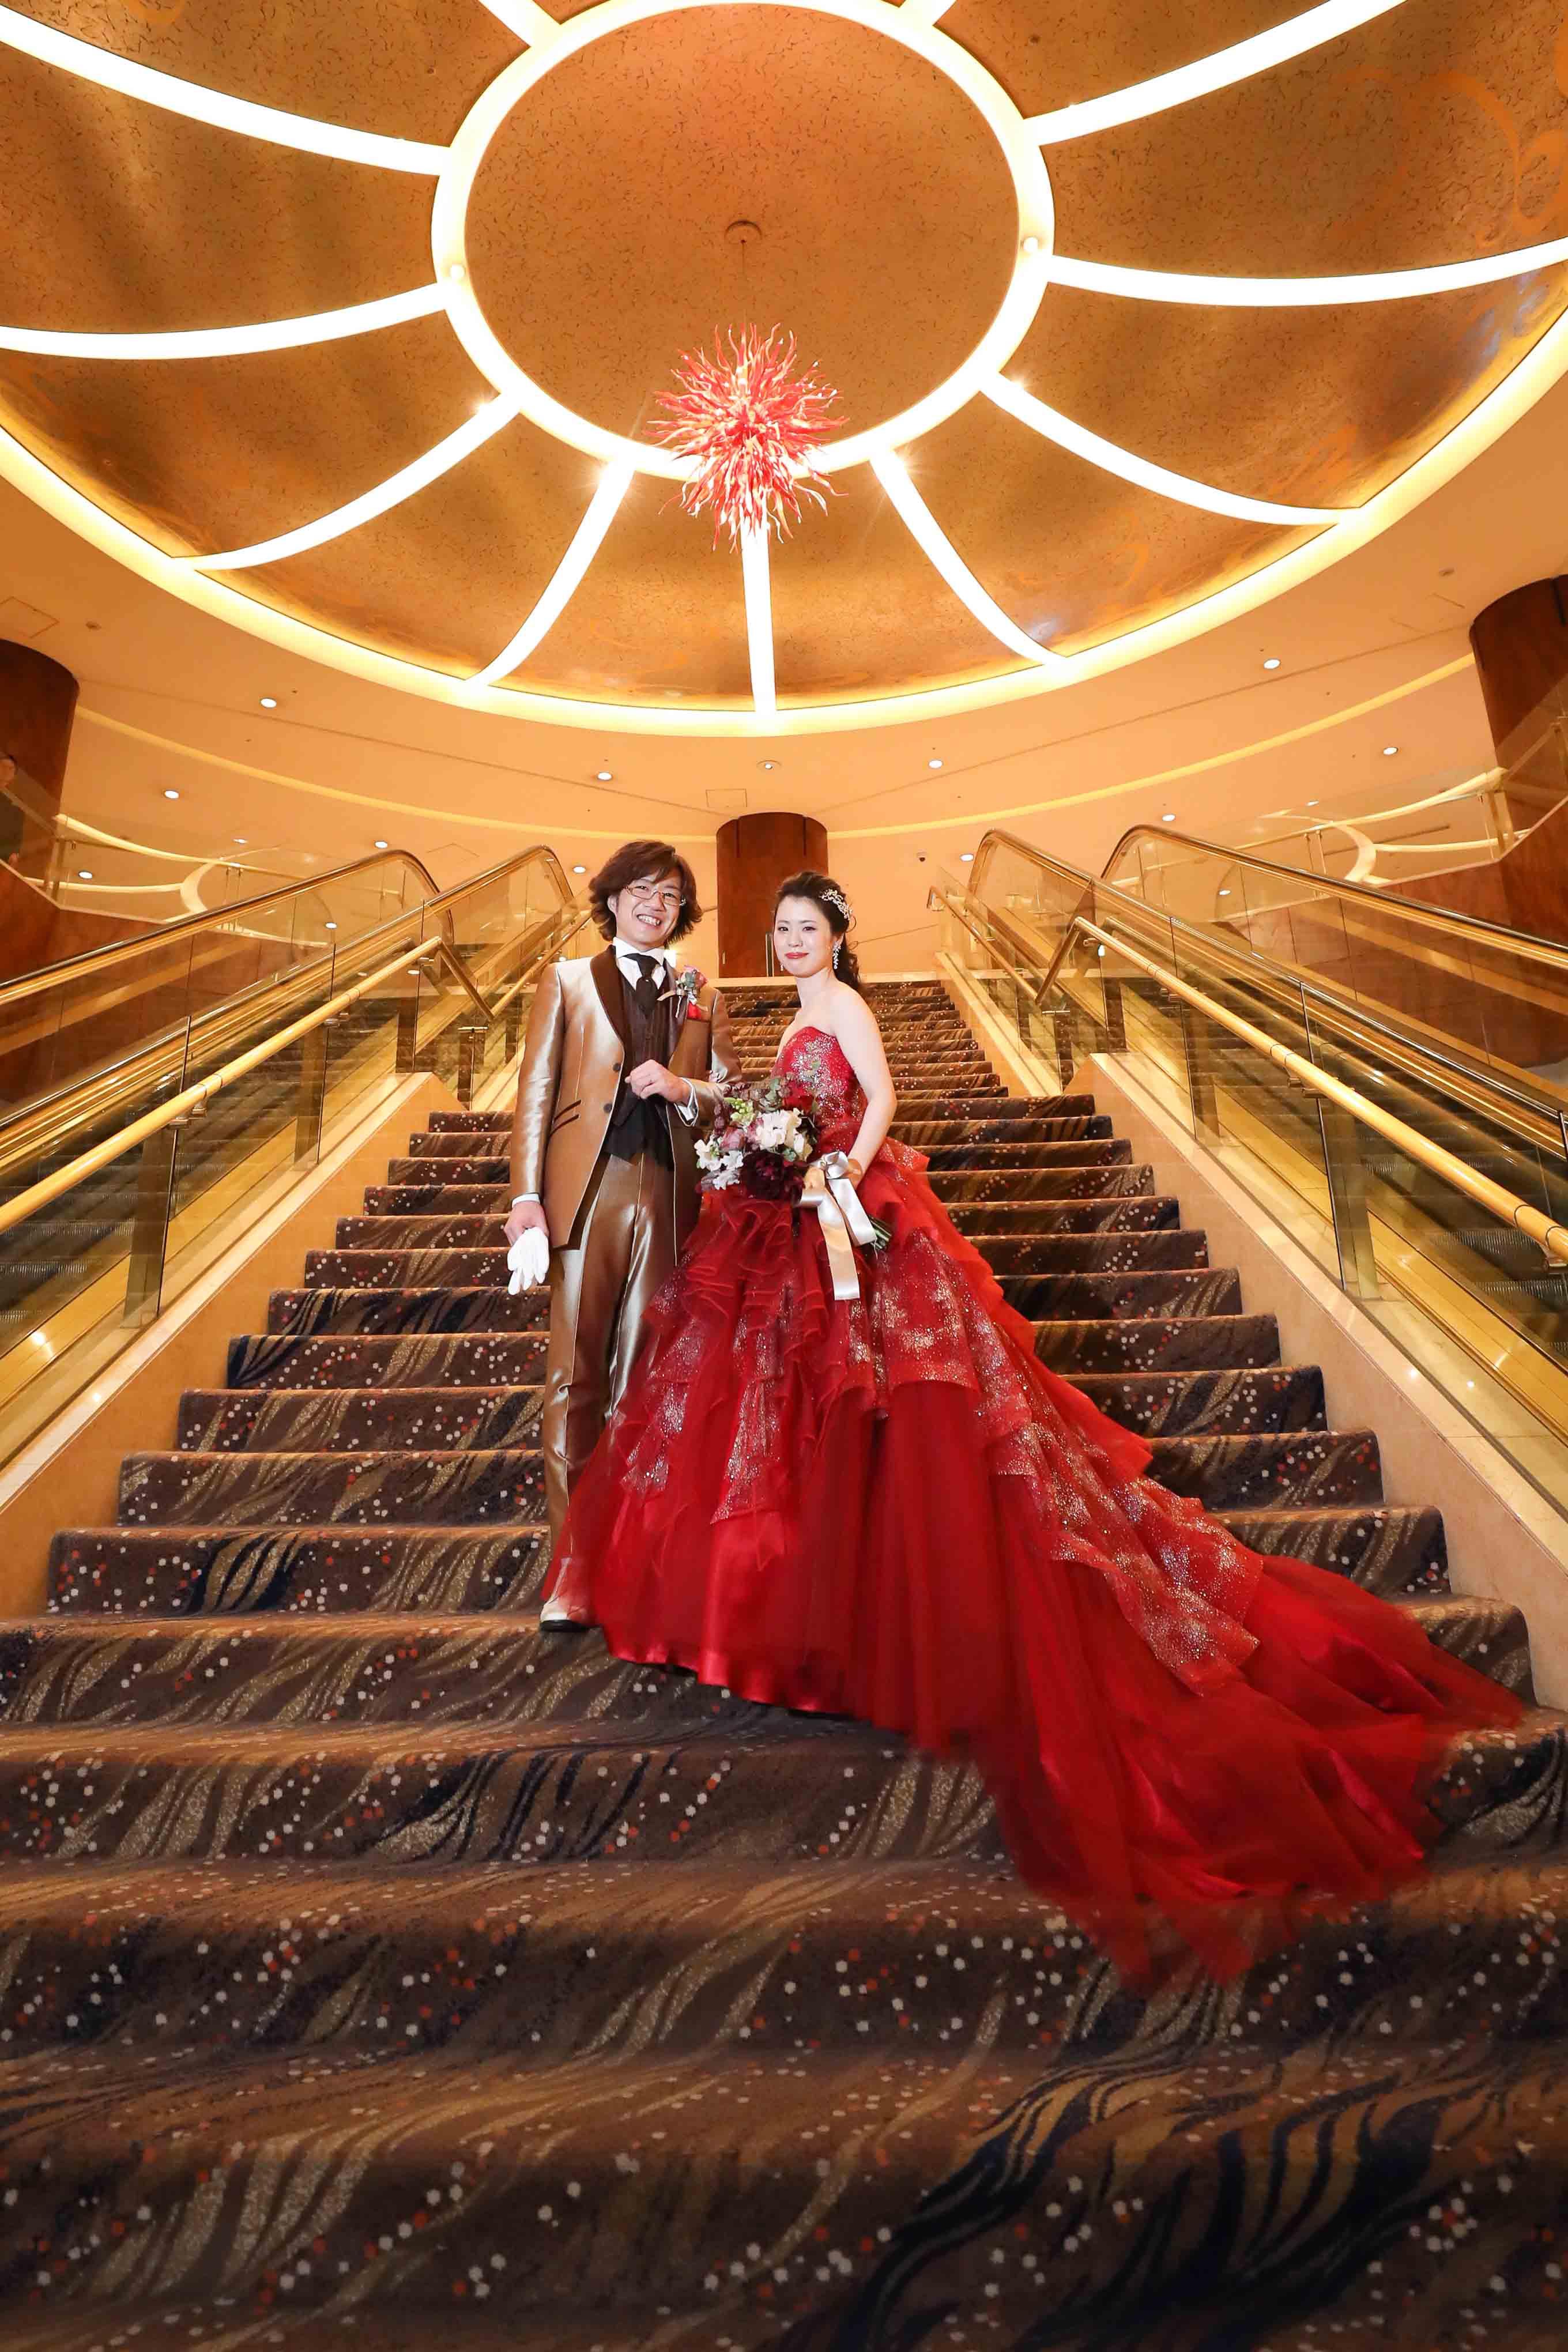 ANホテル結婚式で赤いドレスでお色直し